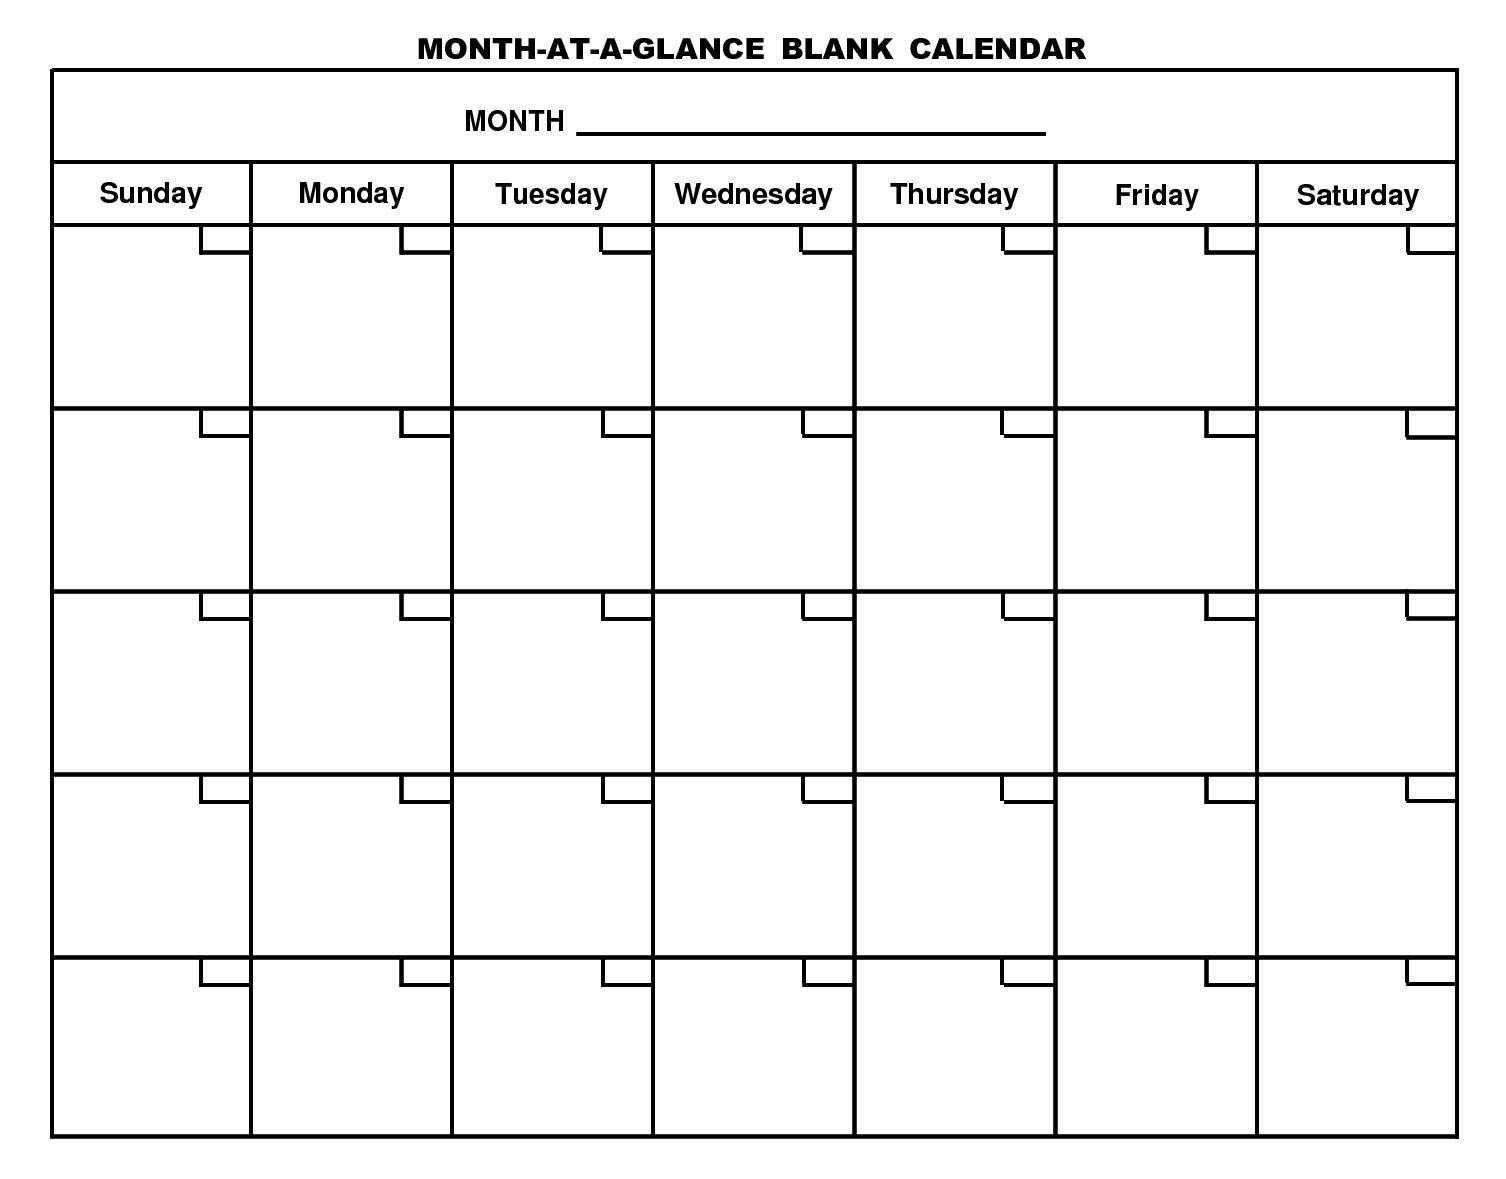 Blank Fill In Calendars 2021 Printable | Calendar Template